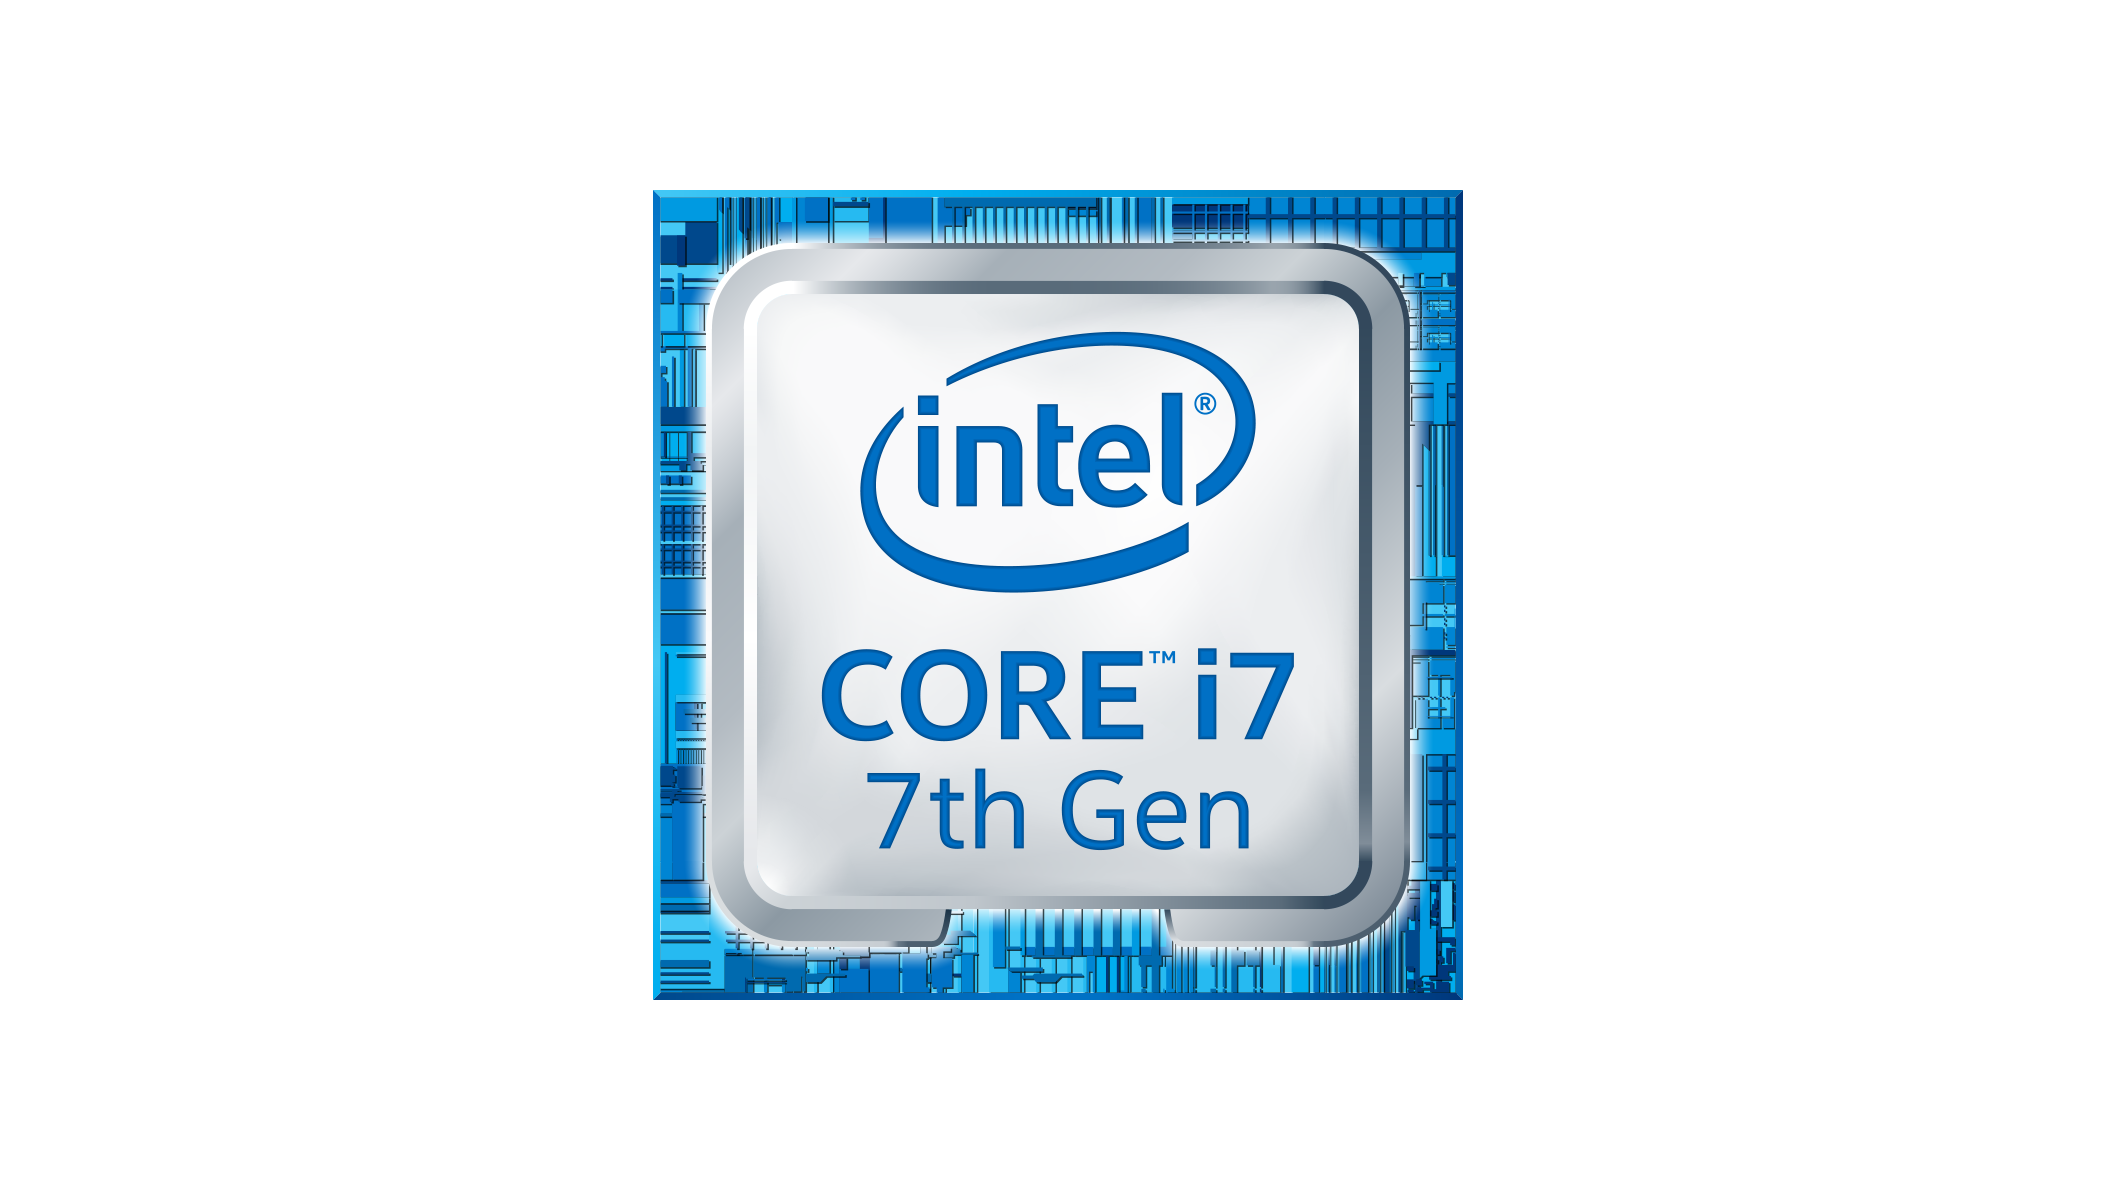 Intel Core i7 7th Gen logo